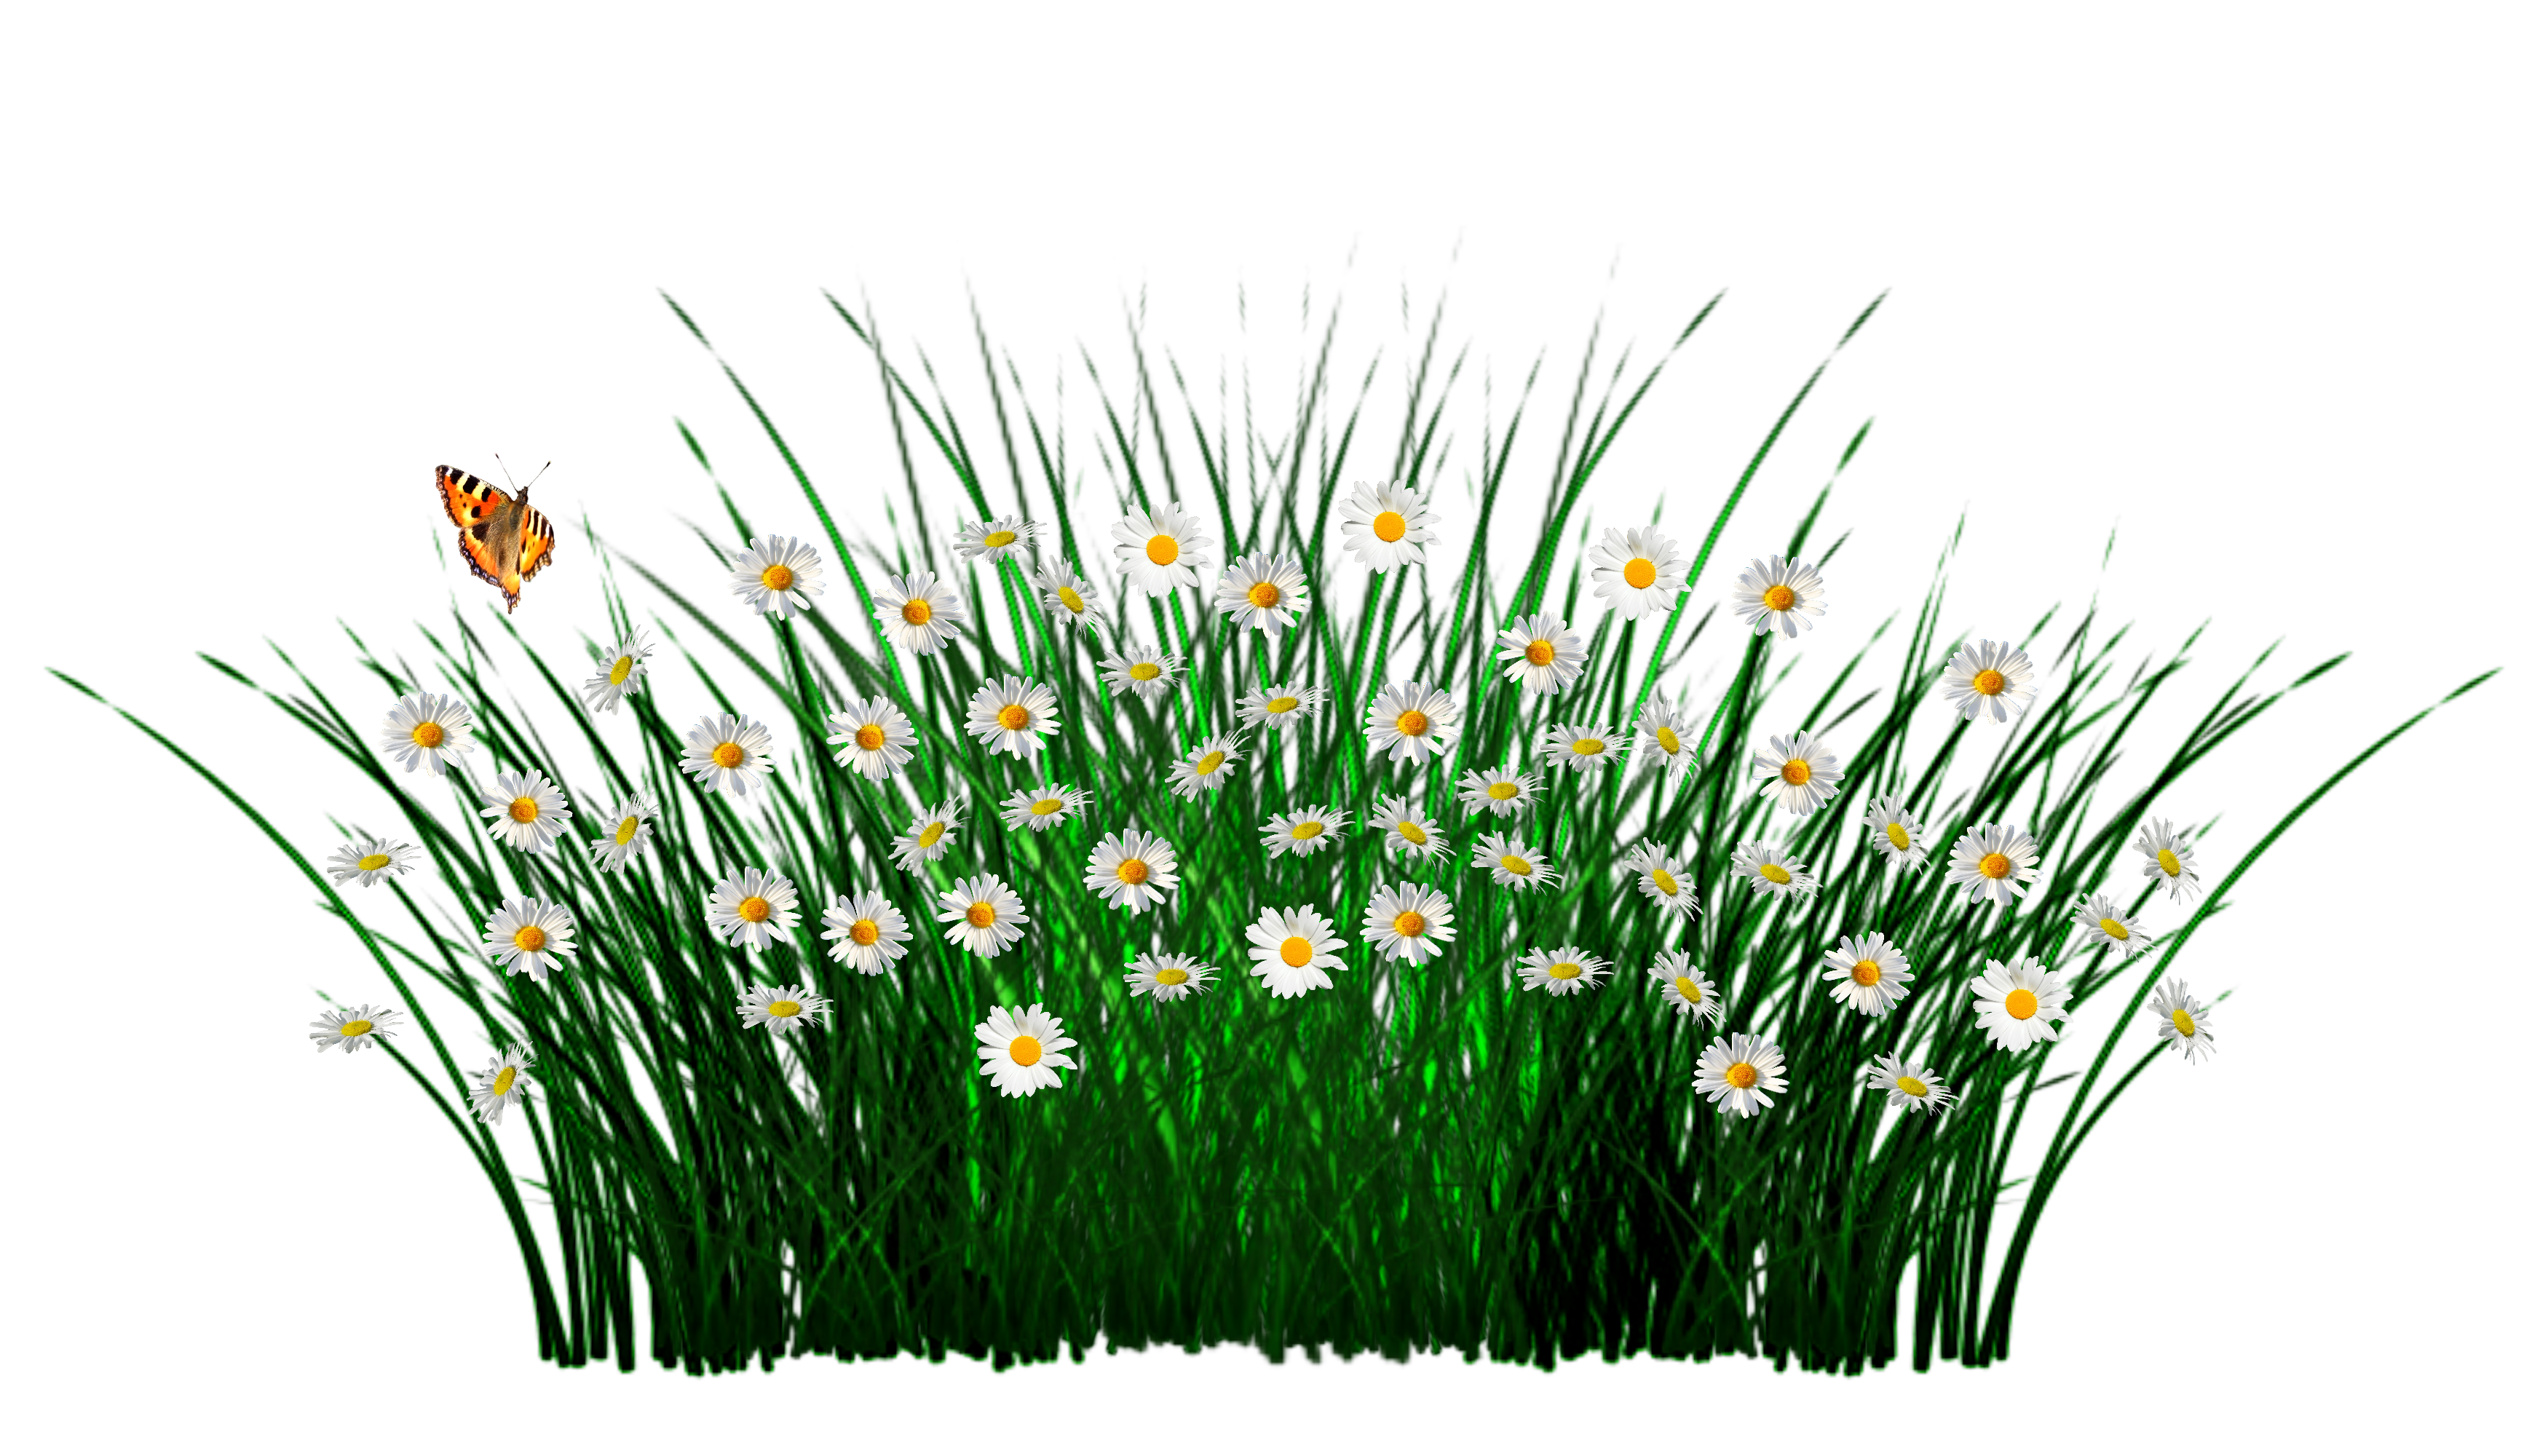 Field clipart field wildflower. Gdynia clip art transprent